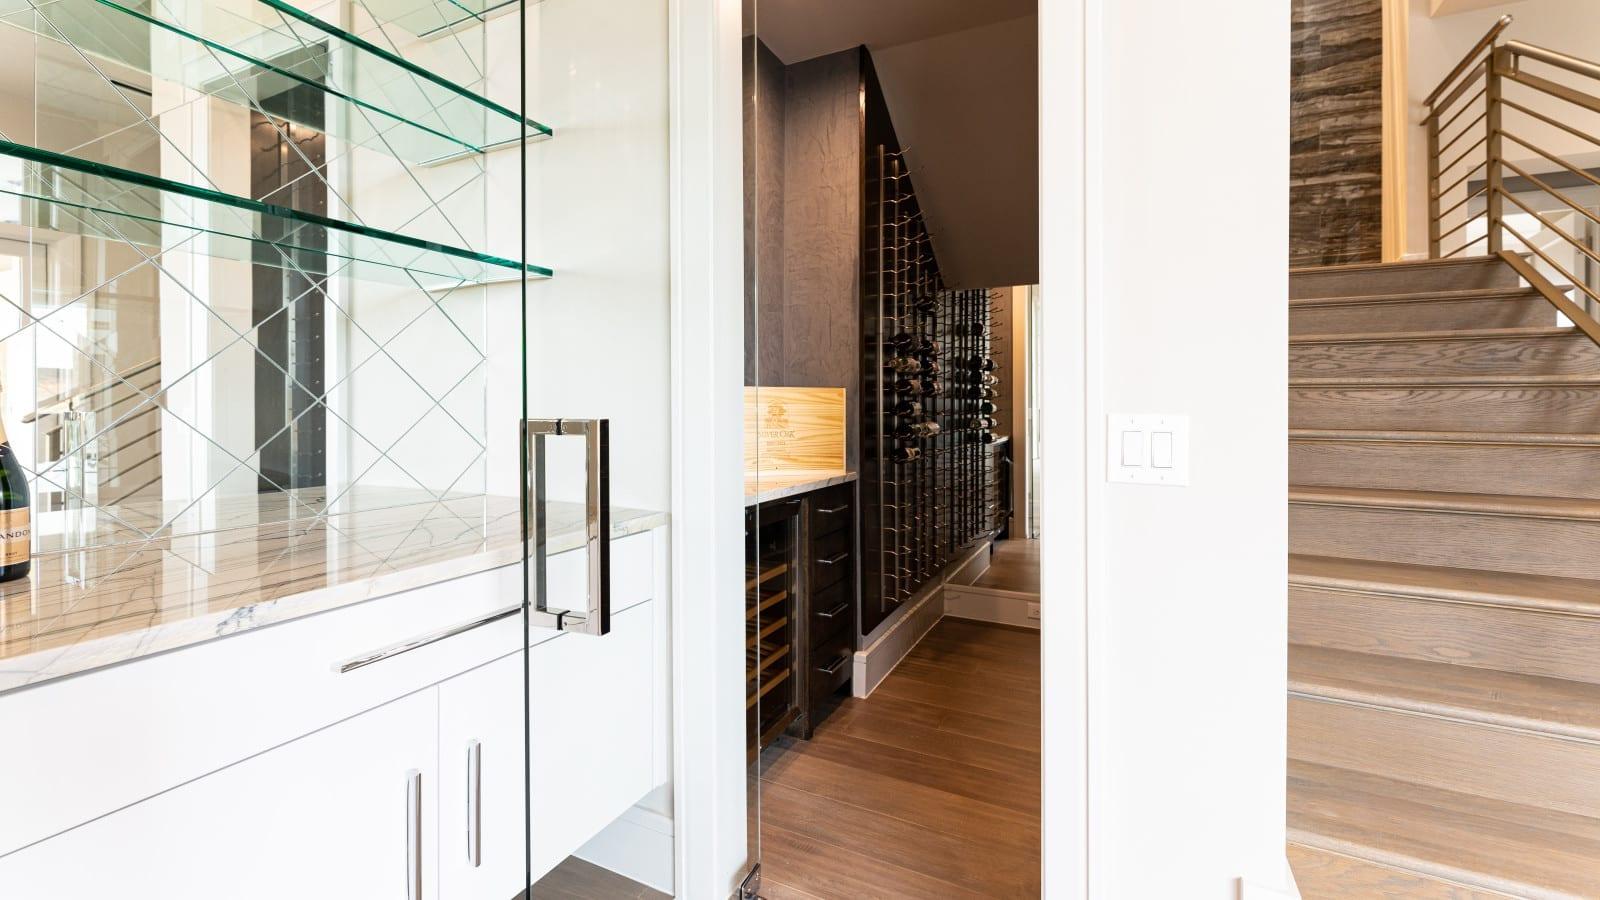 Modern Style Homes design # 24 - Millennial Design + Build